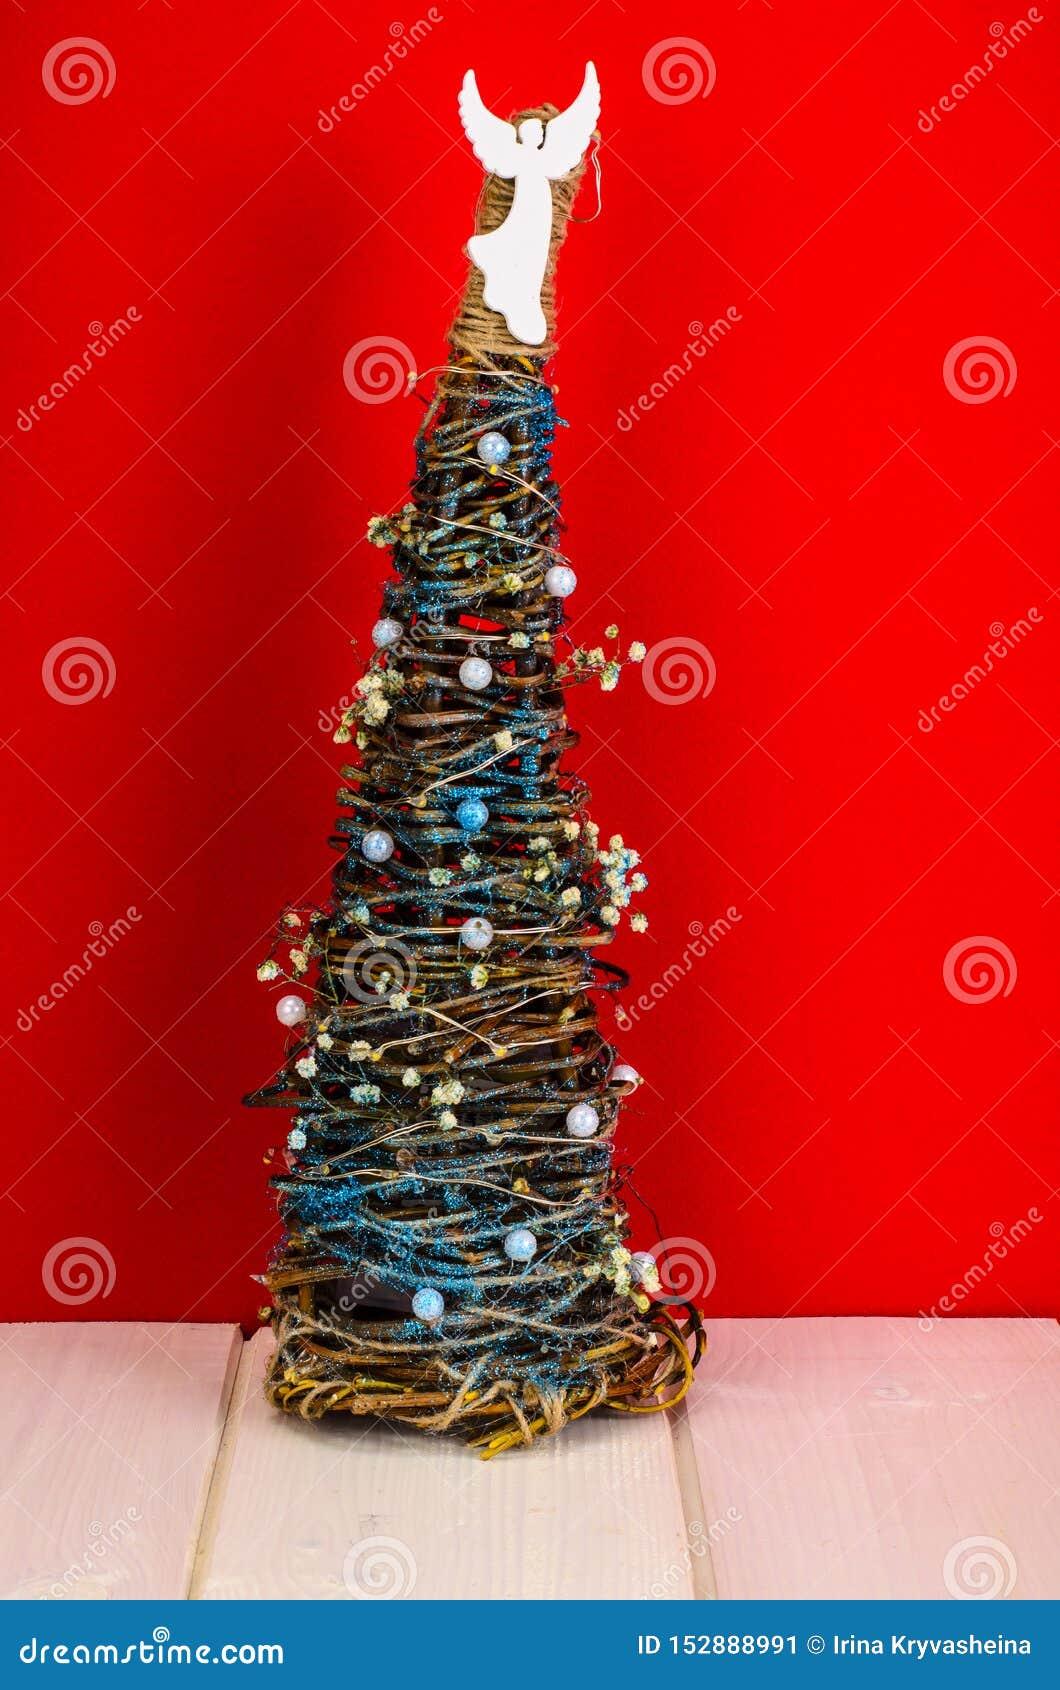 Homemade wicker Christmas crafts